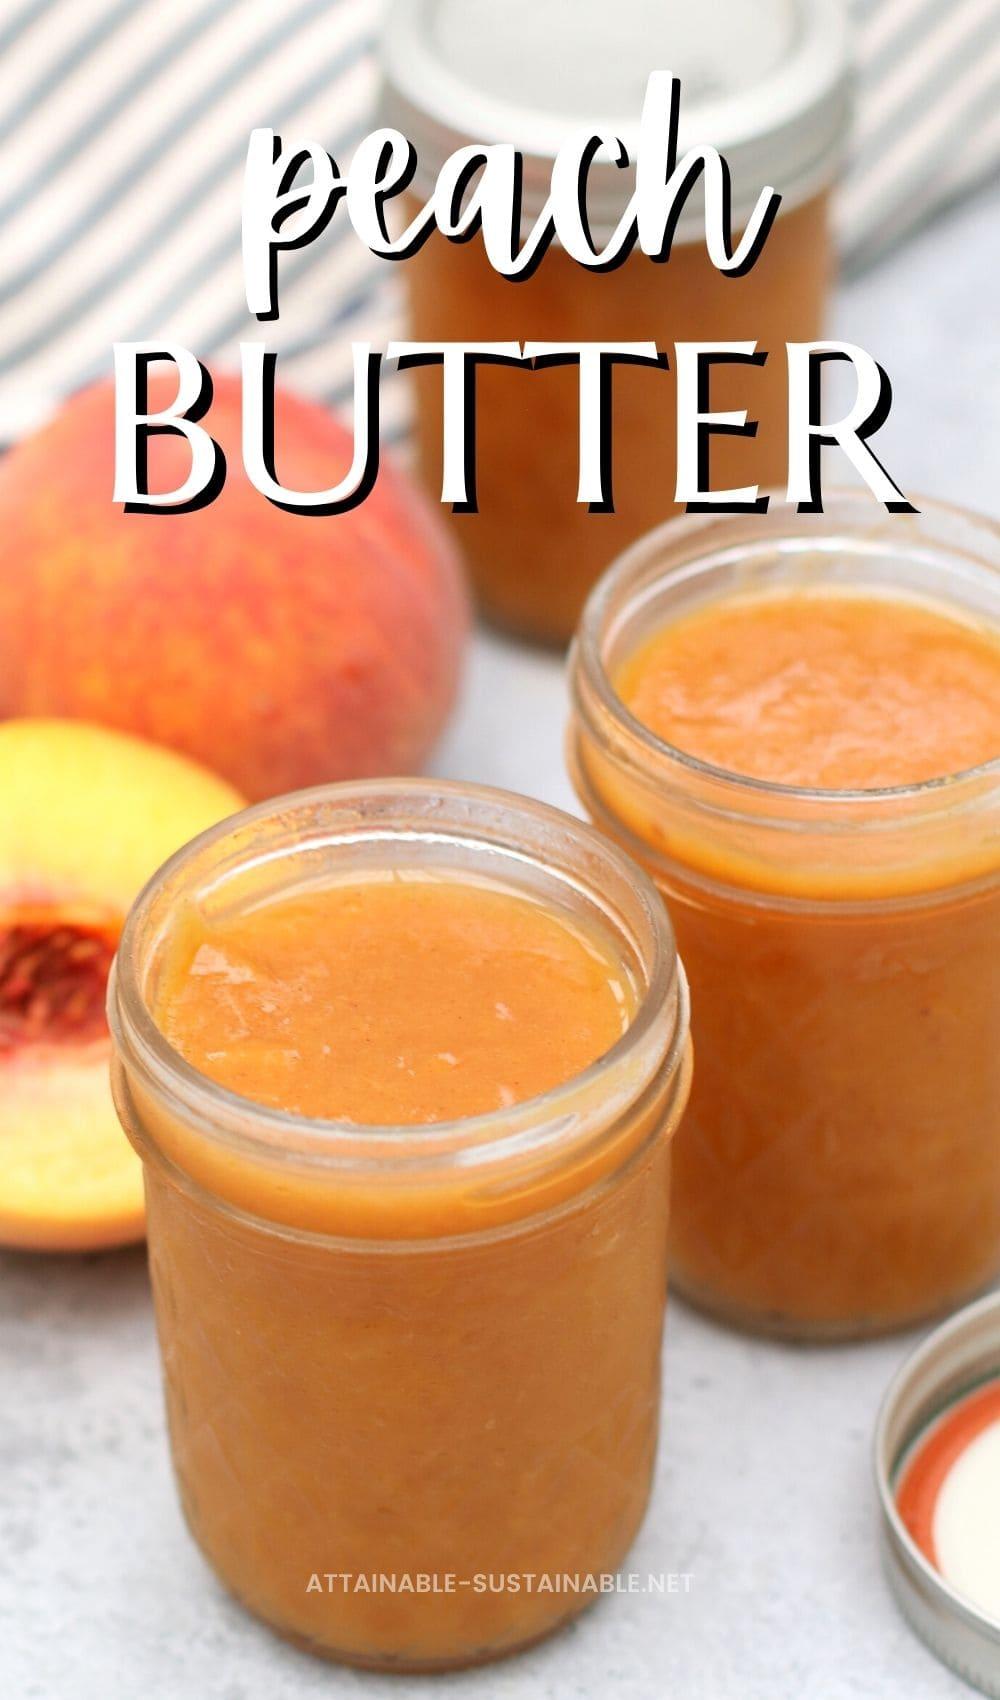 jars of peach butter